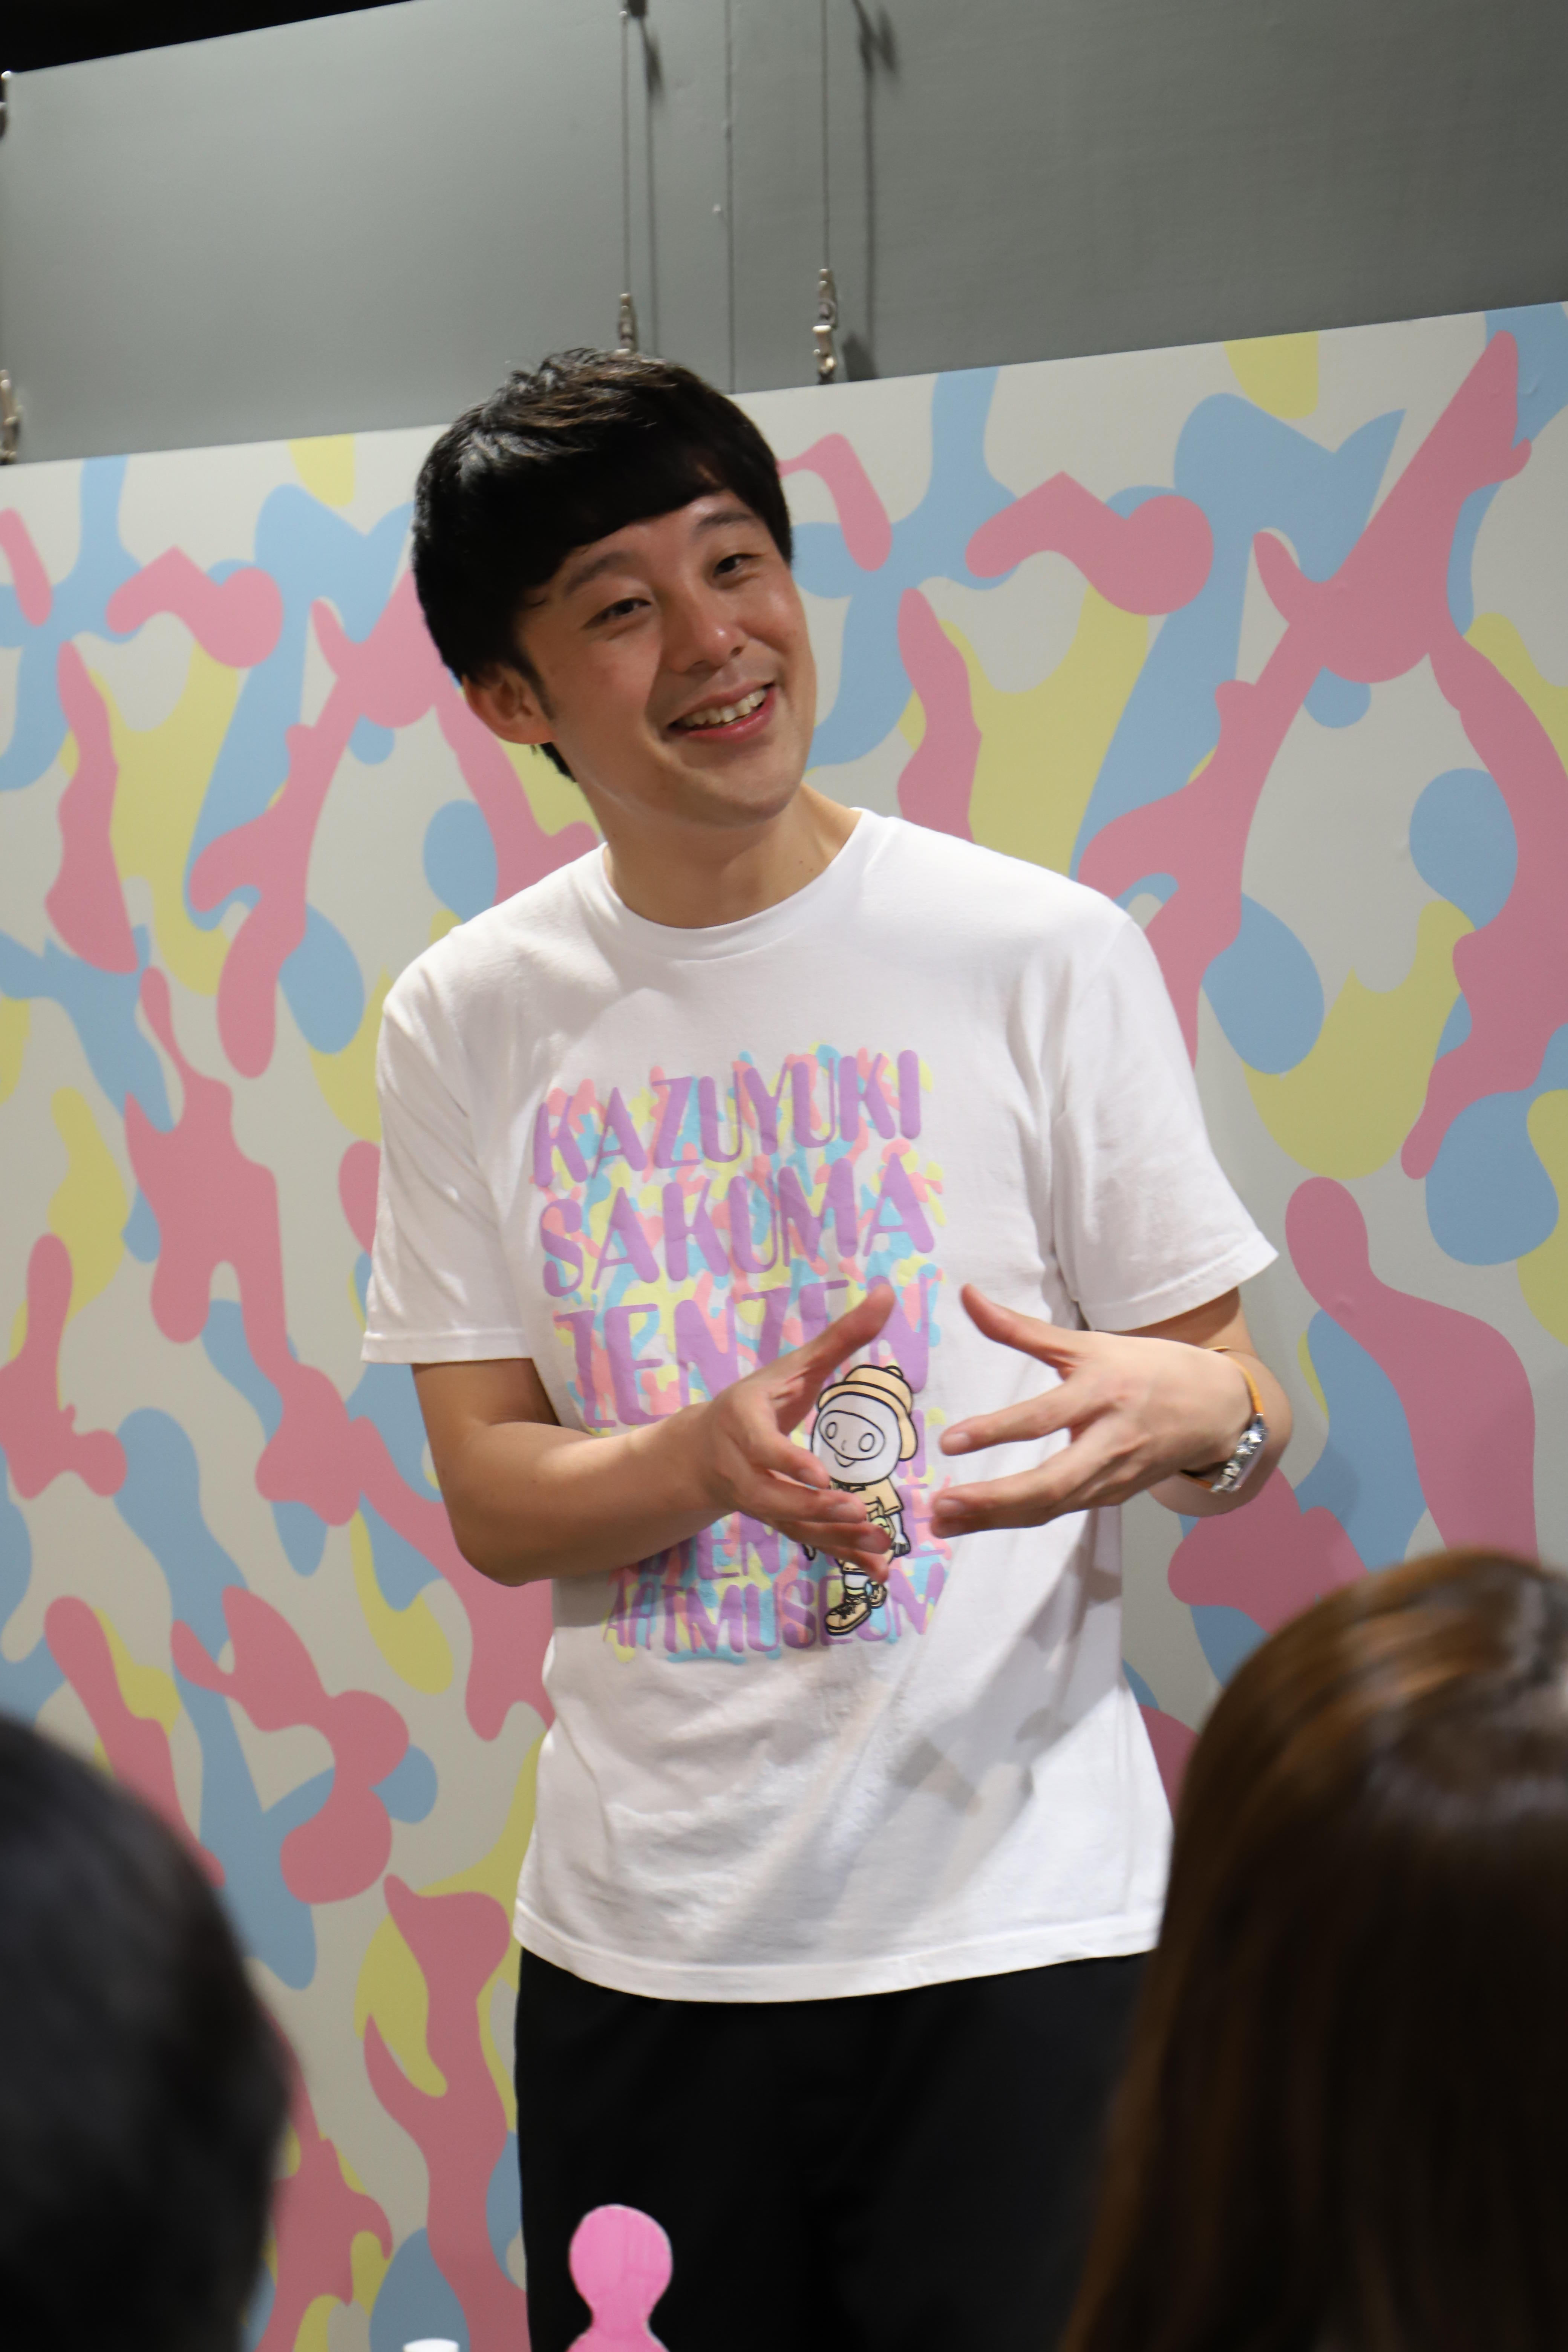 http://news.yoshimoto.co.jp/20180429222115-8381b330d1ab2febe6fc934b889891f618ea3a5a.jpg